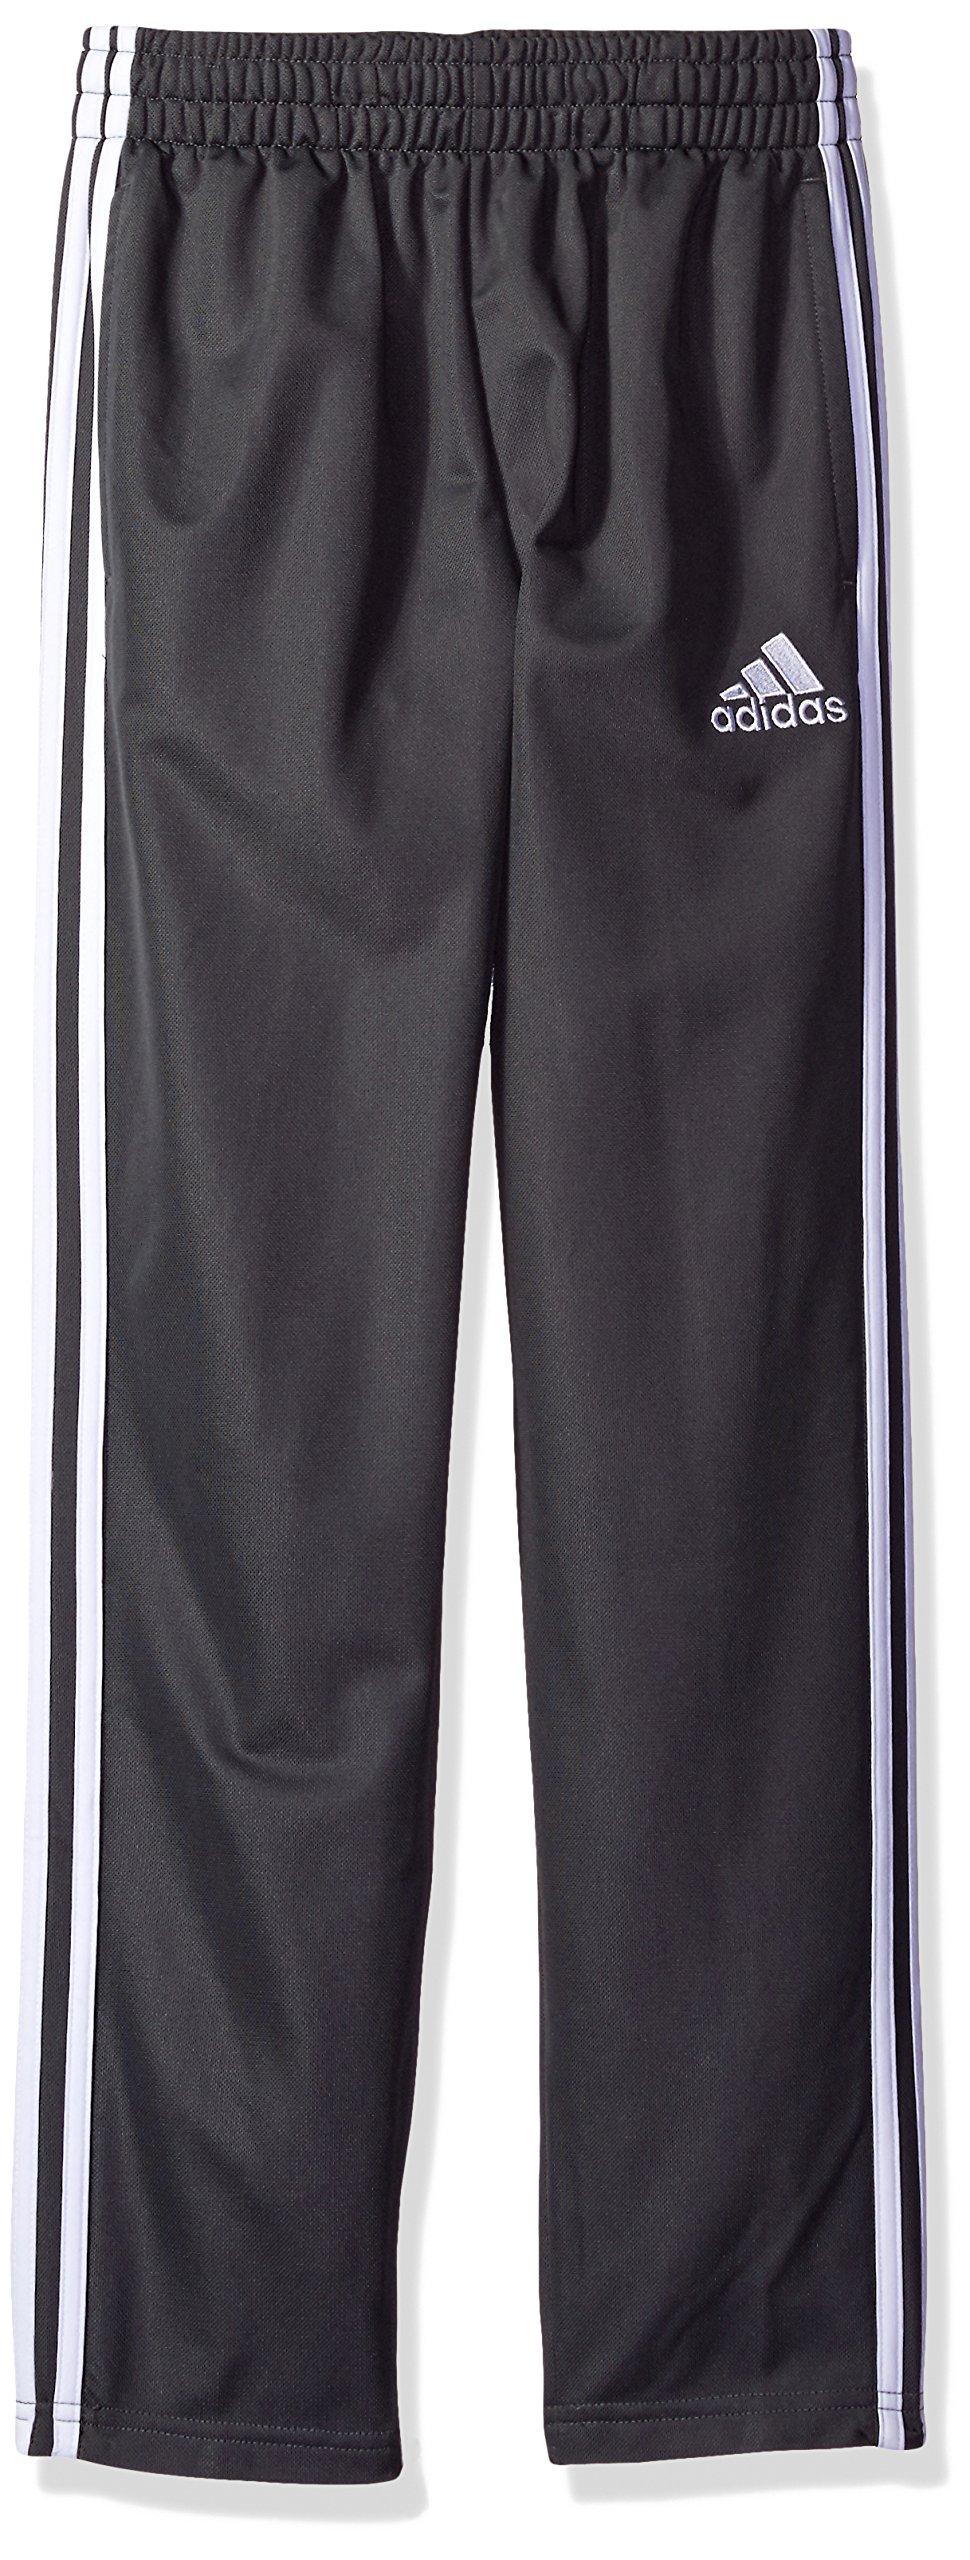 adidas Boys' Big Tricot Pant, Dark Gray, XL